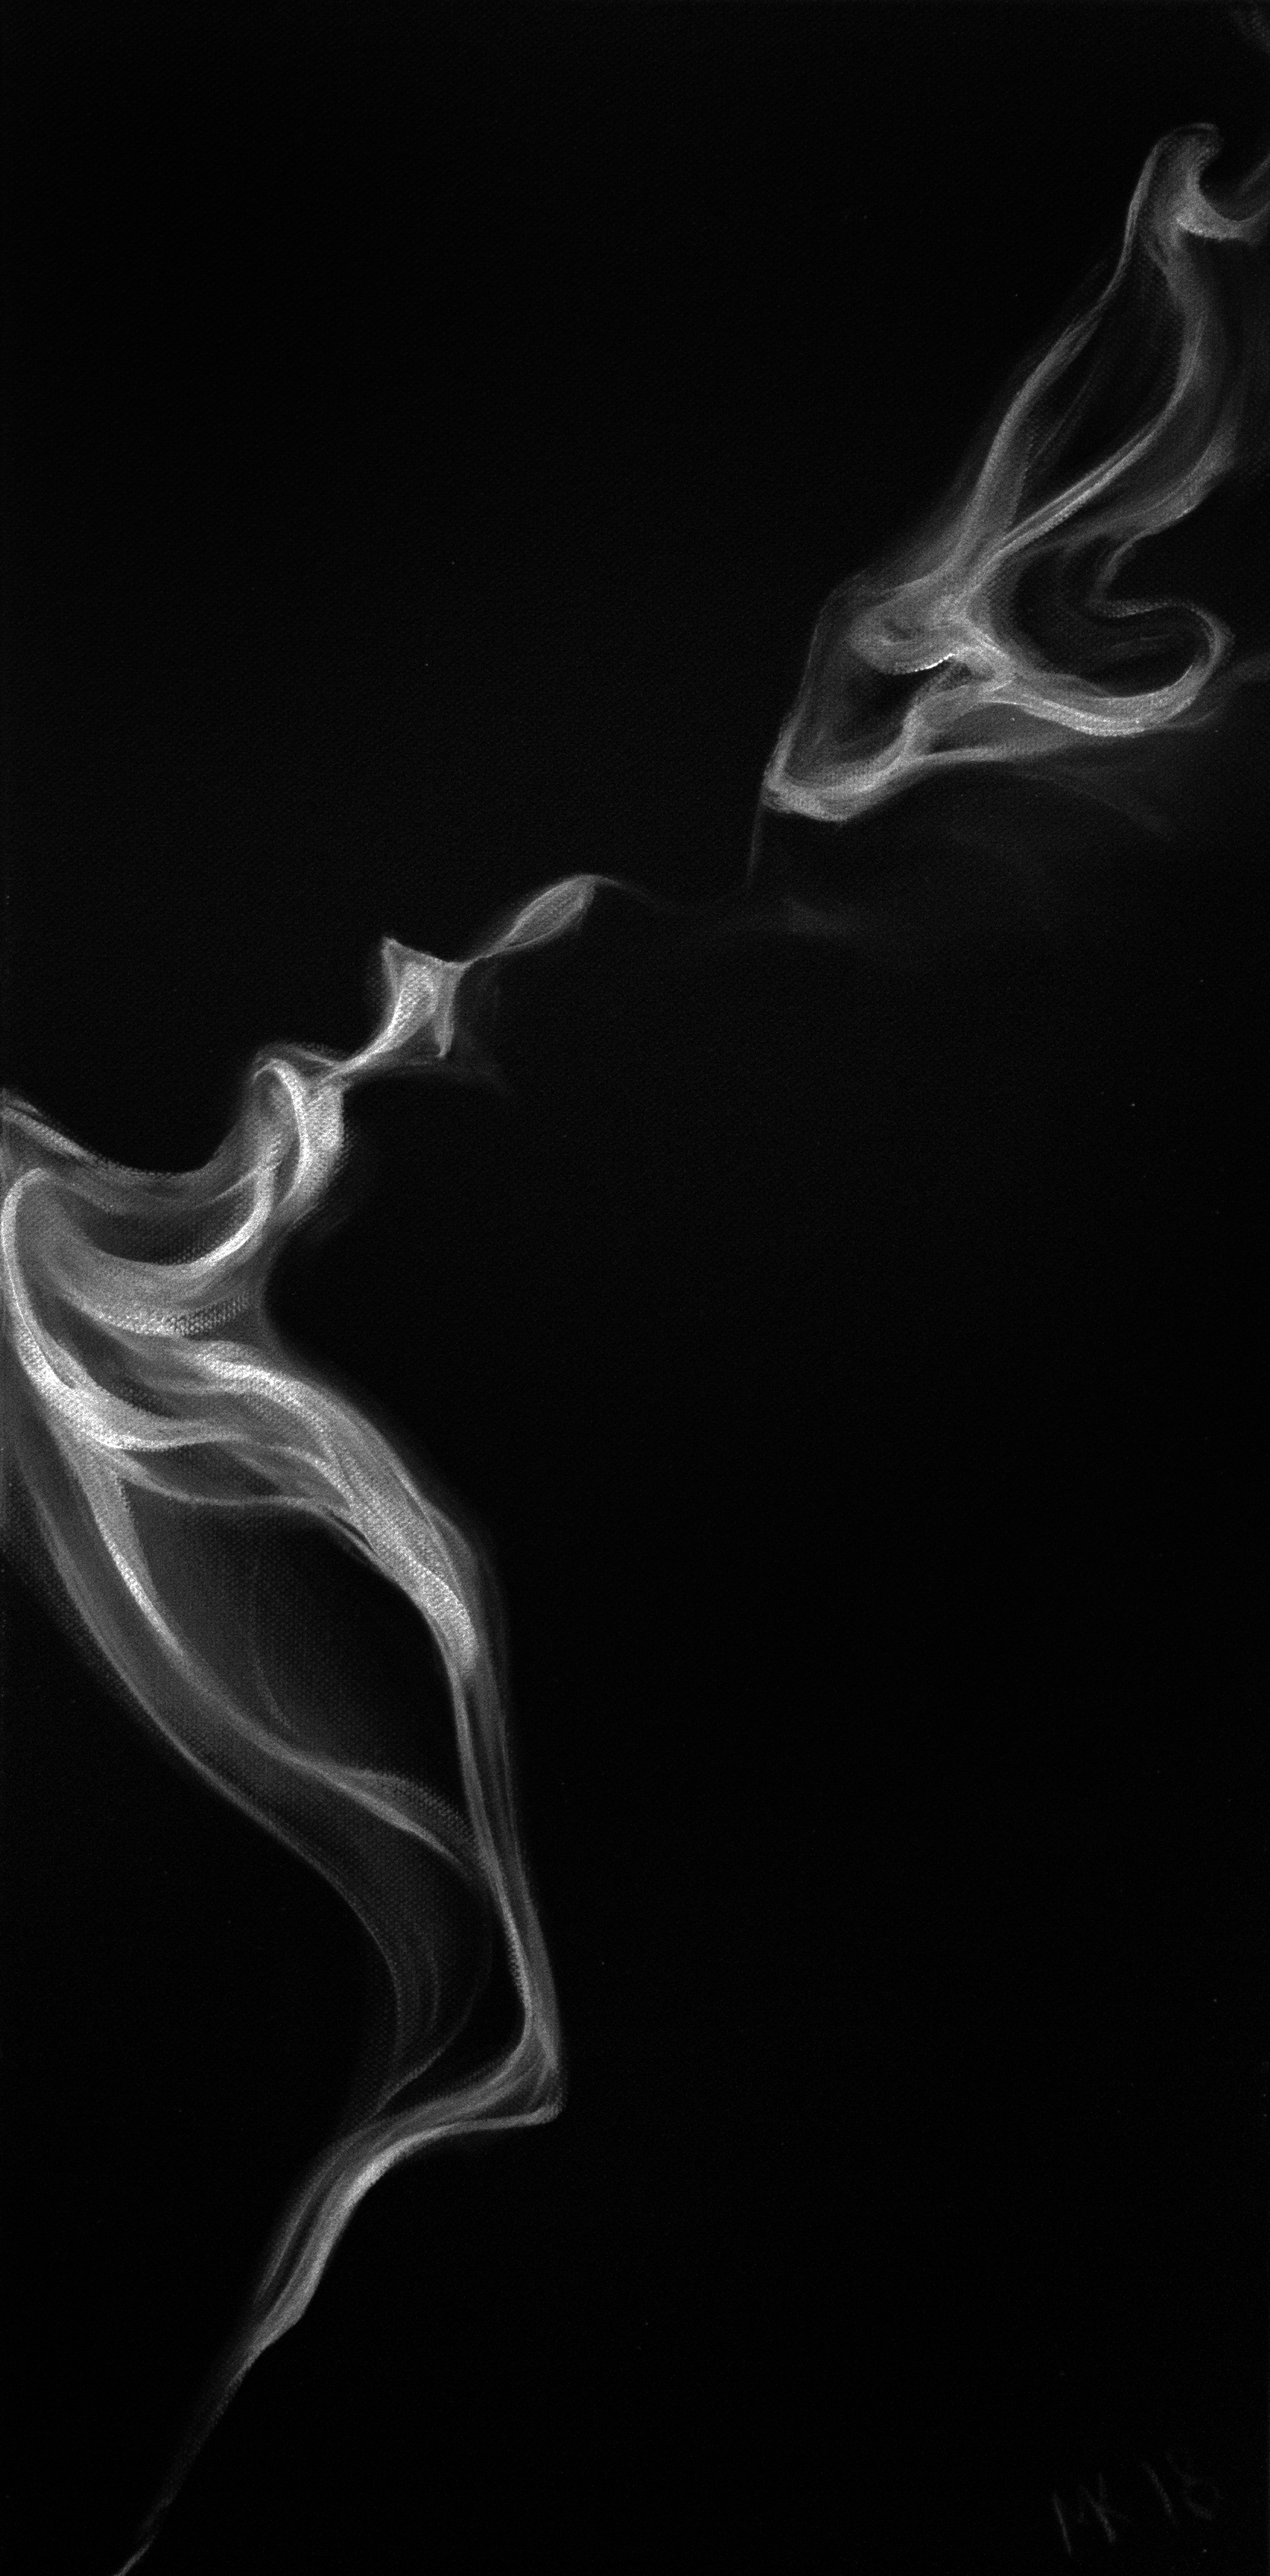 Kiss 2 -Mher Khachatryan